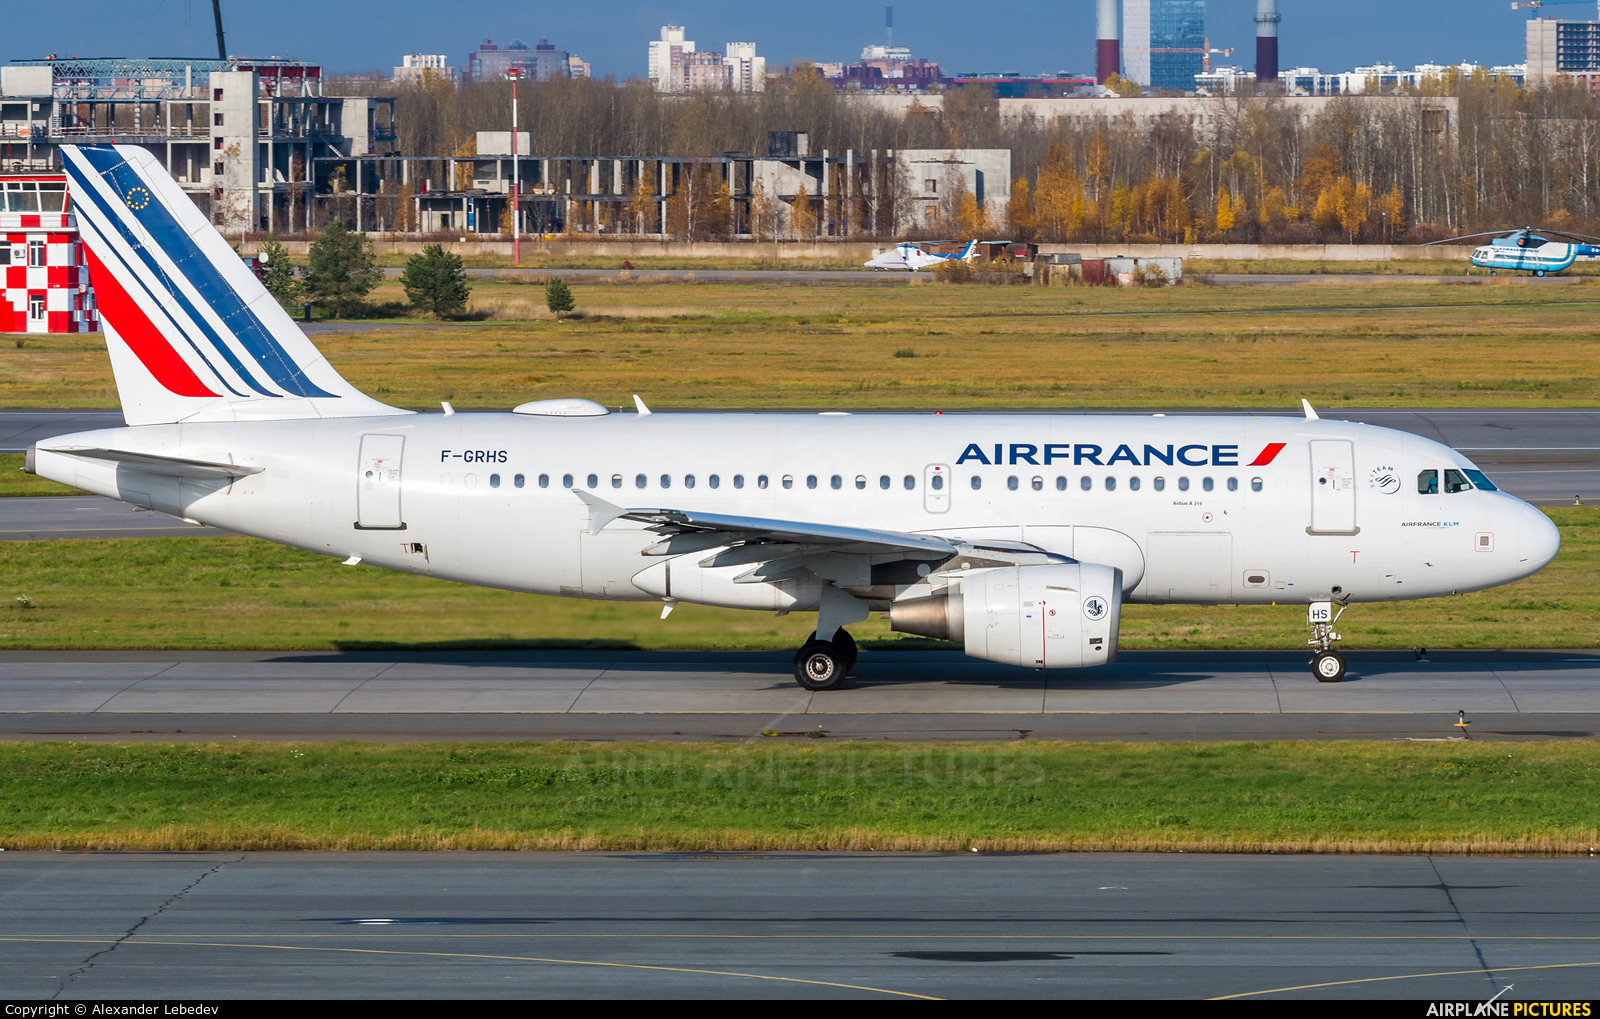 Air France F-GRHS aircraft at St. Petersburg - Pulkovo